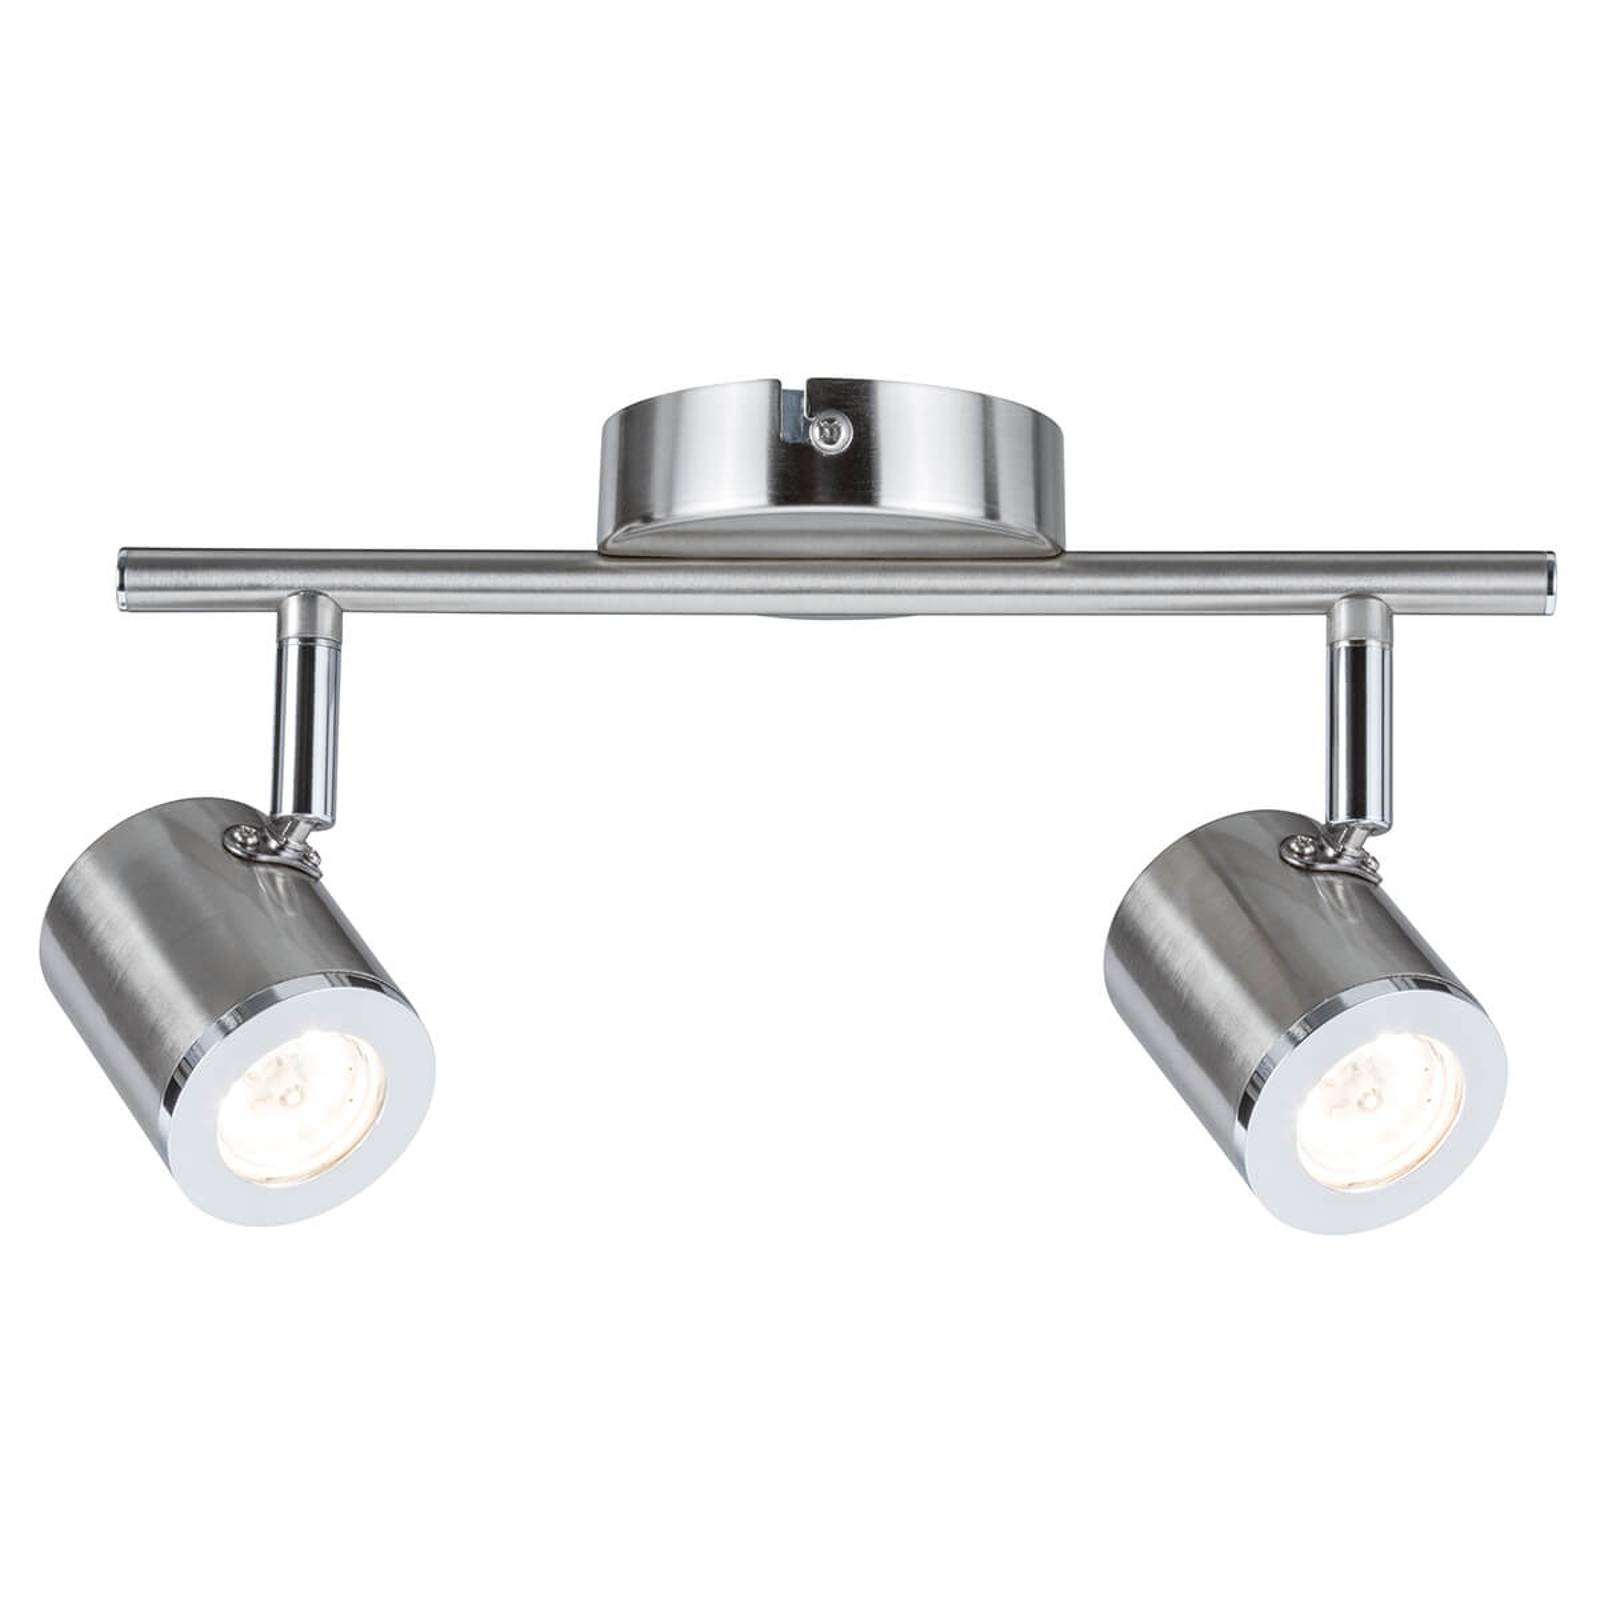 Lampa sufitowa LED Tumbler ciepła biel